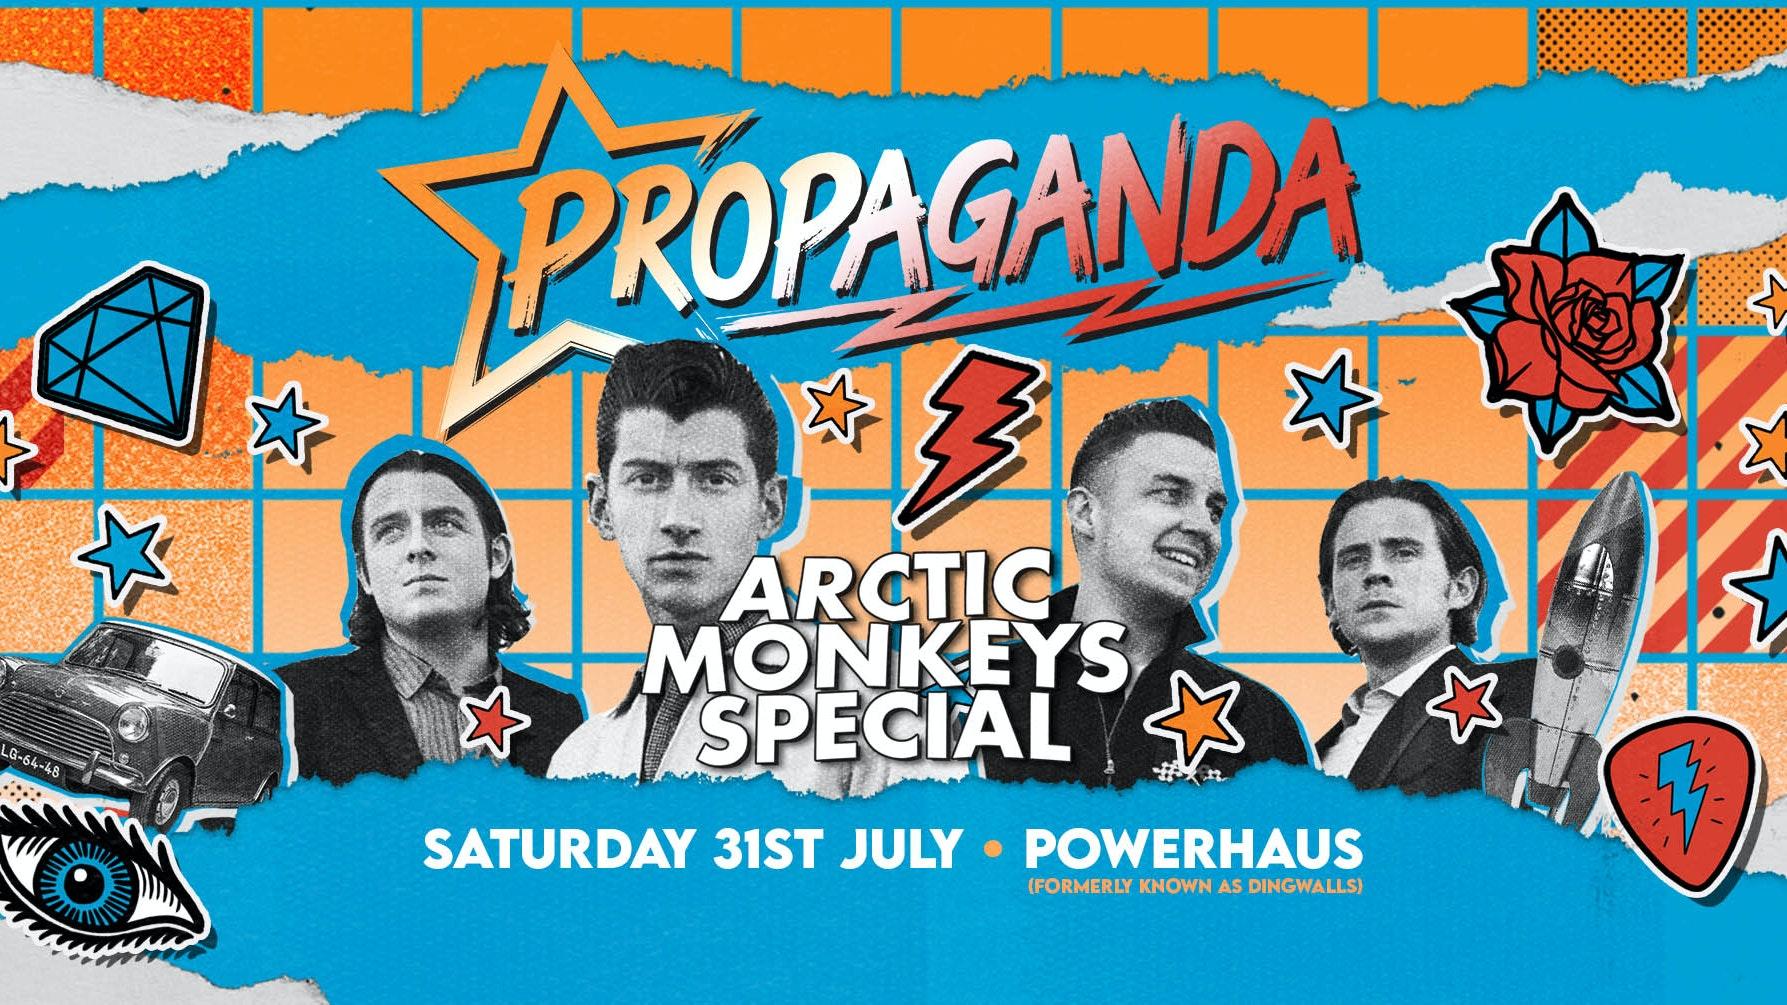 Propaganda London – Arctic Monkeys Special!